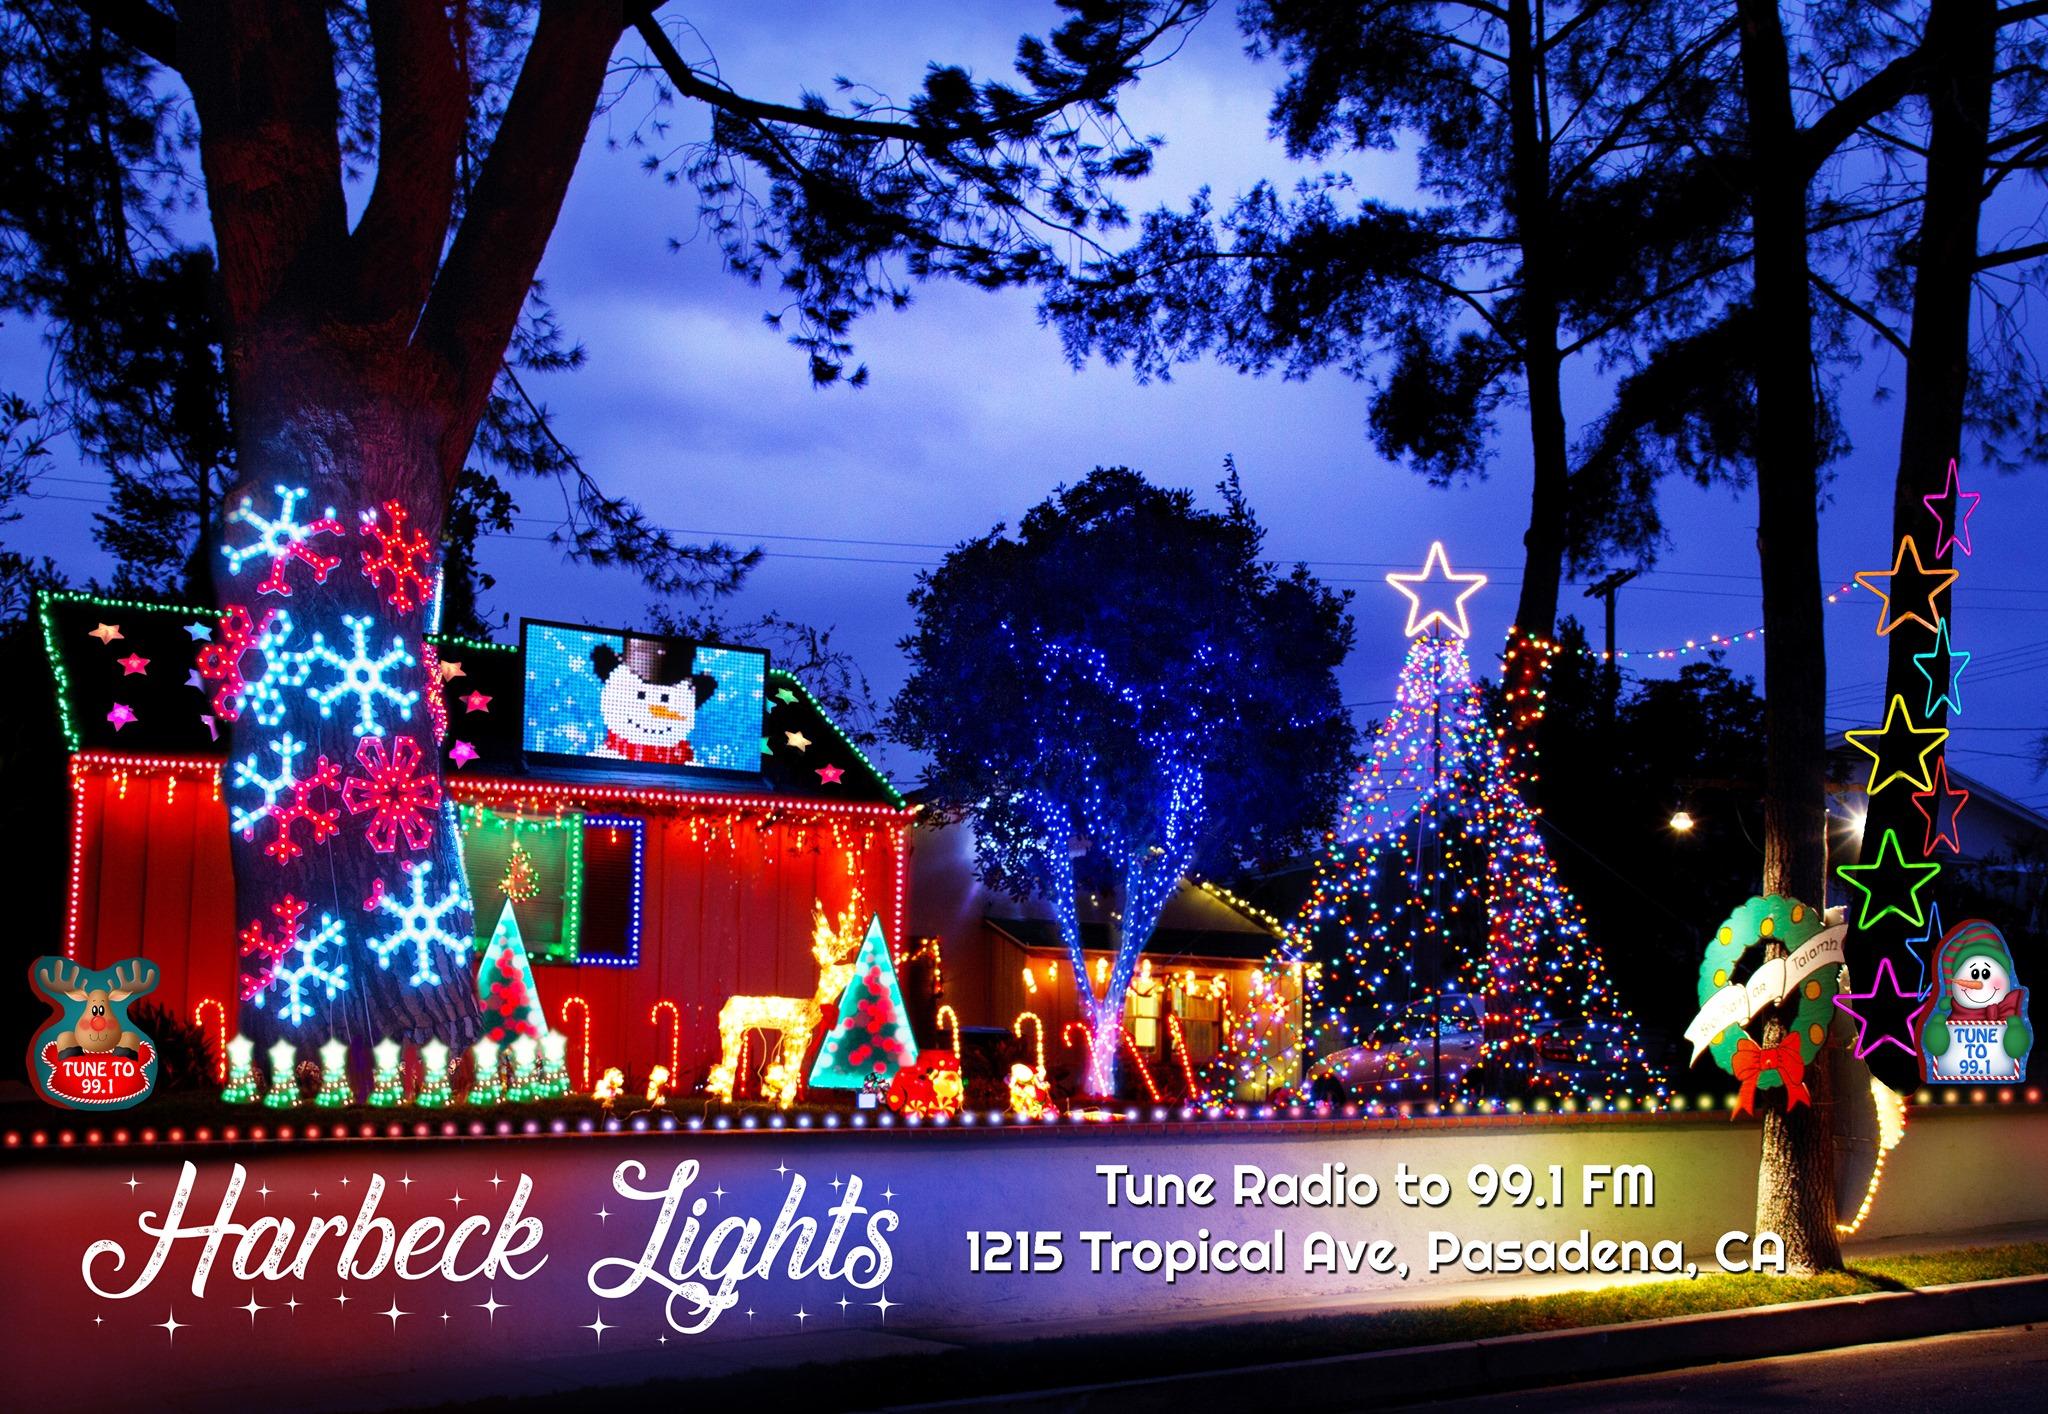 Harbeck Lights